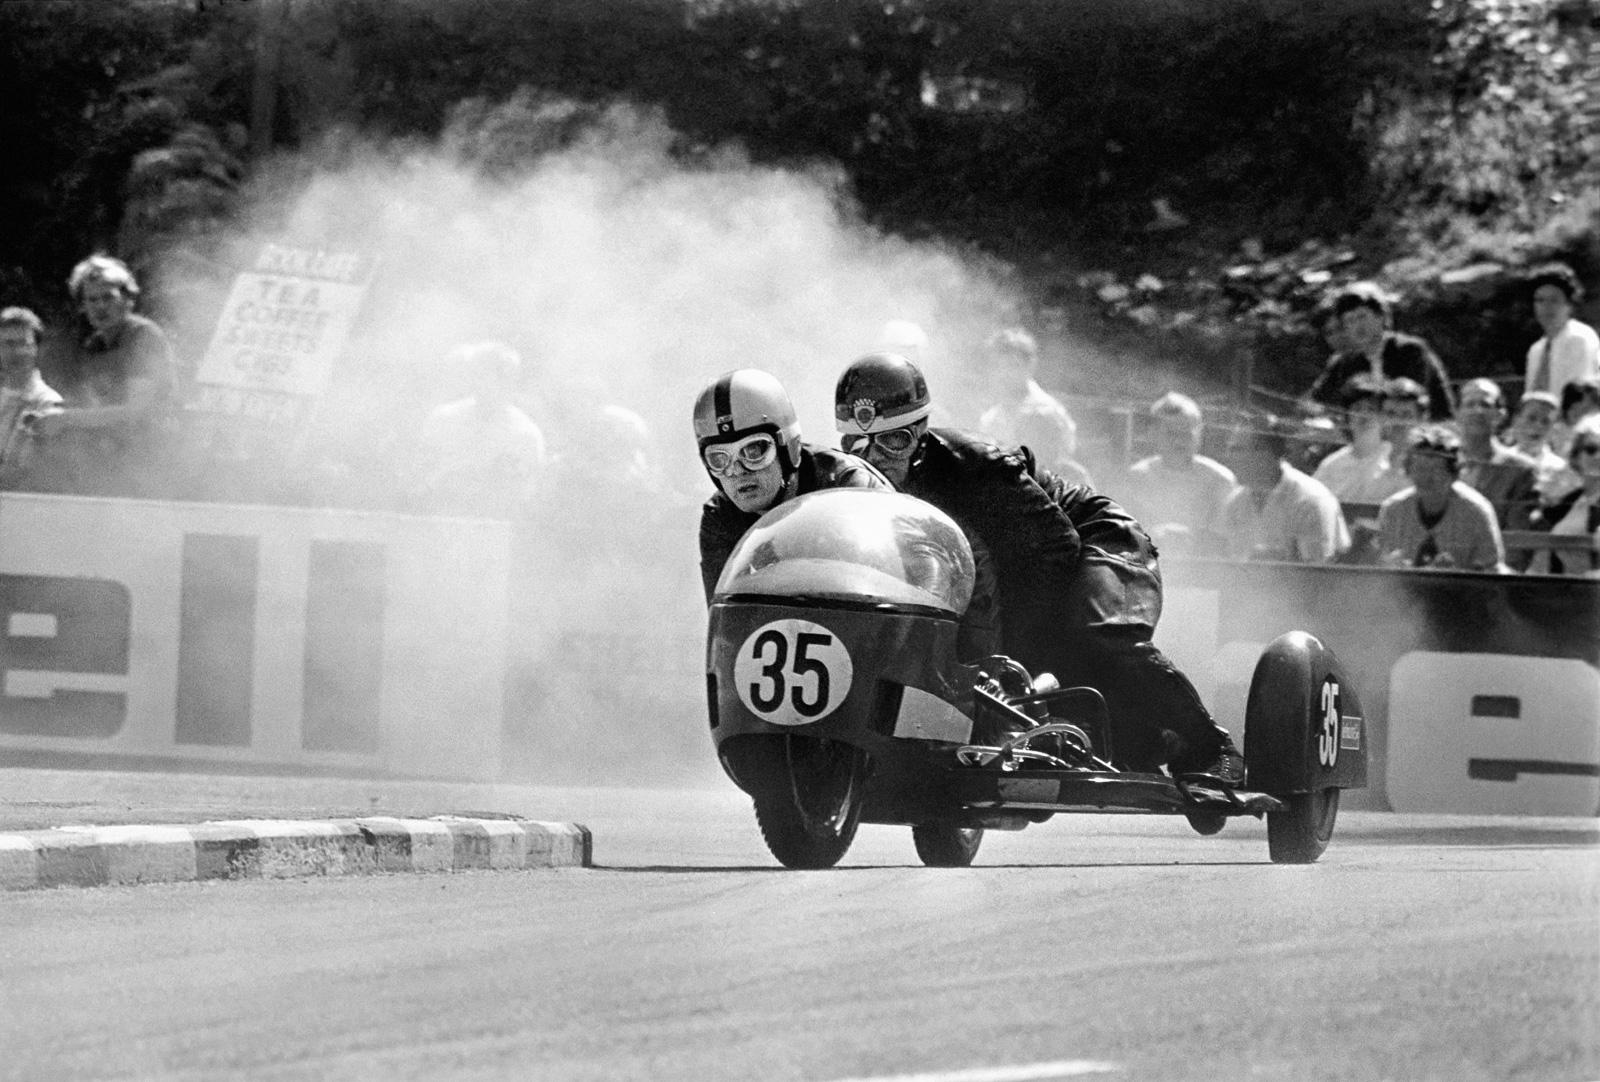 Classic side car racing